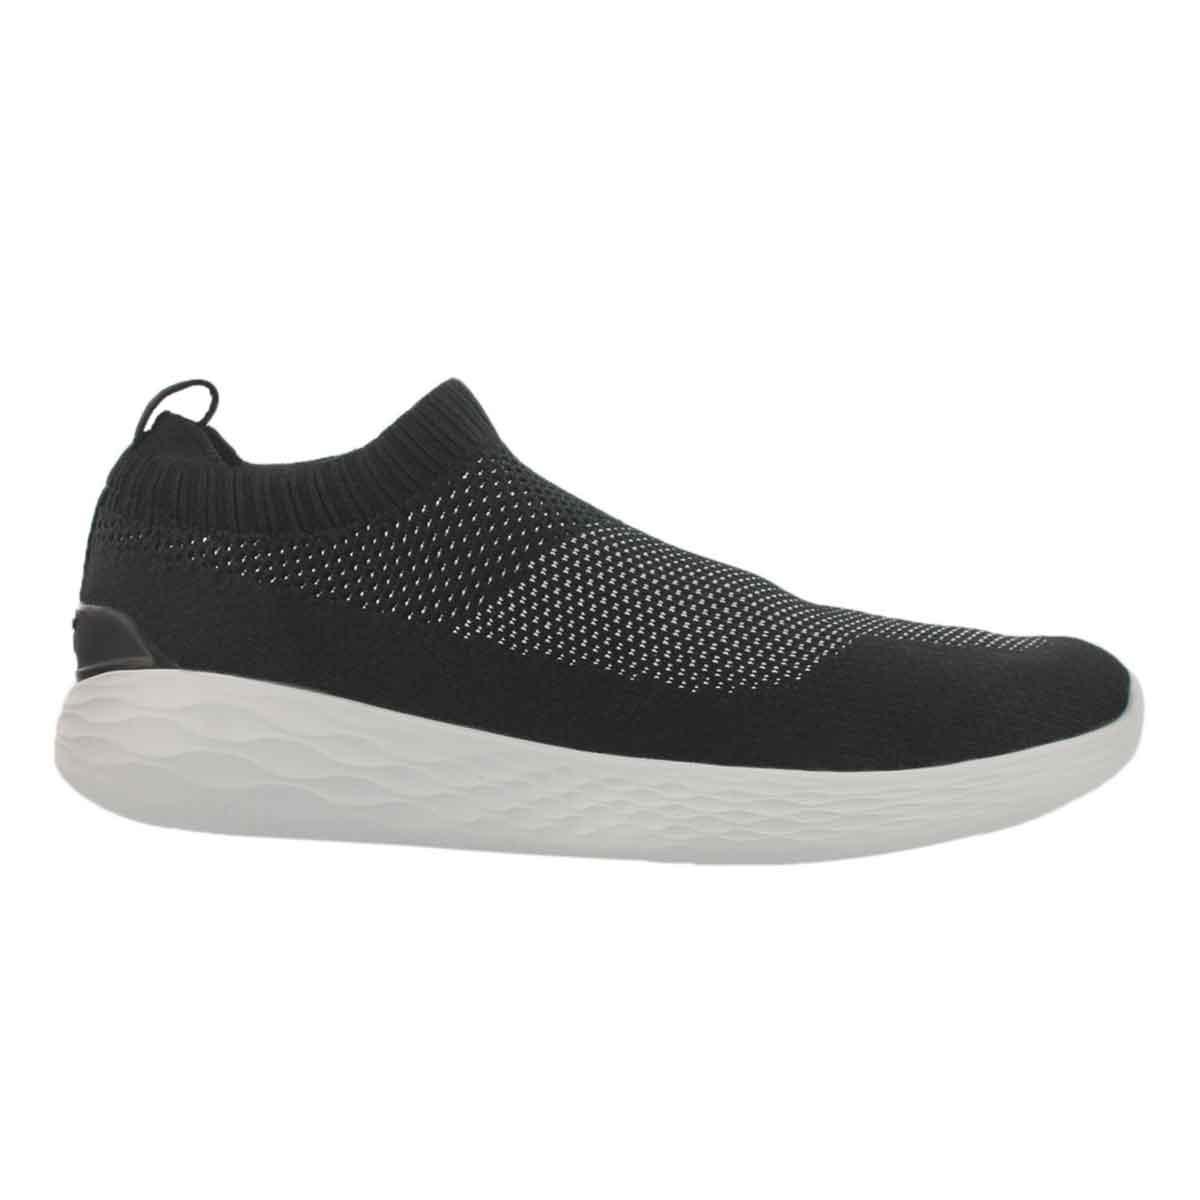 Mns GO Strike blk/wht slip on shoe